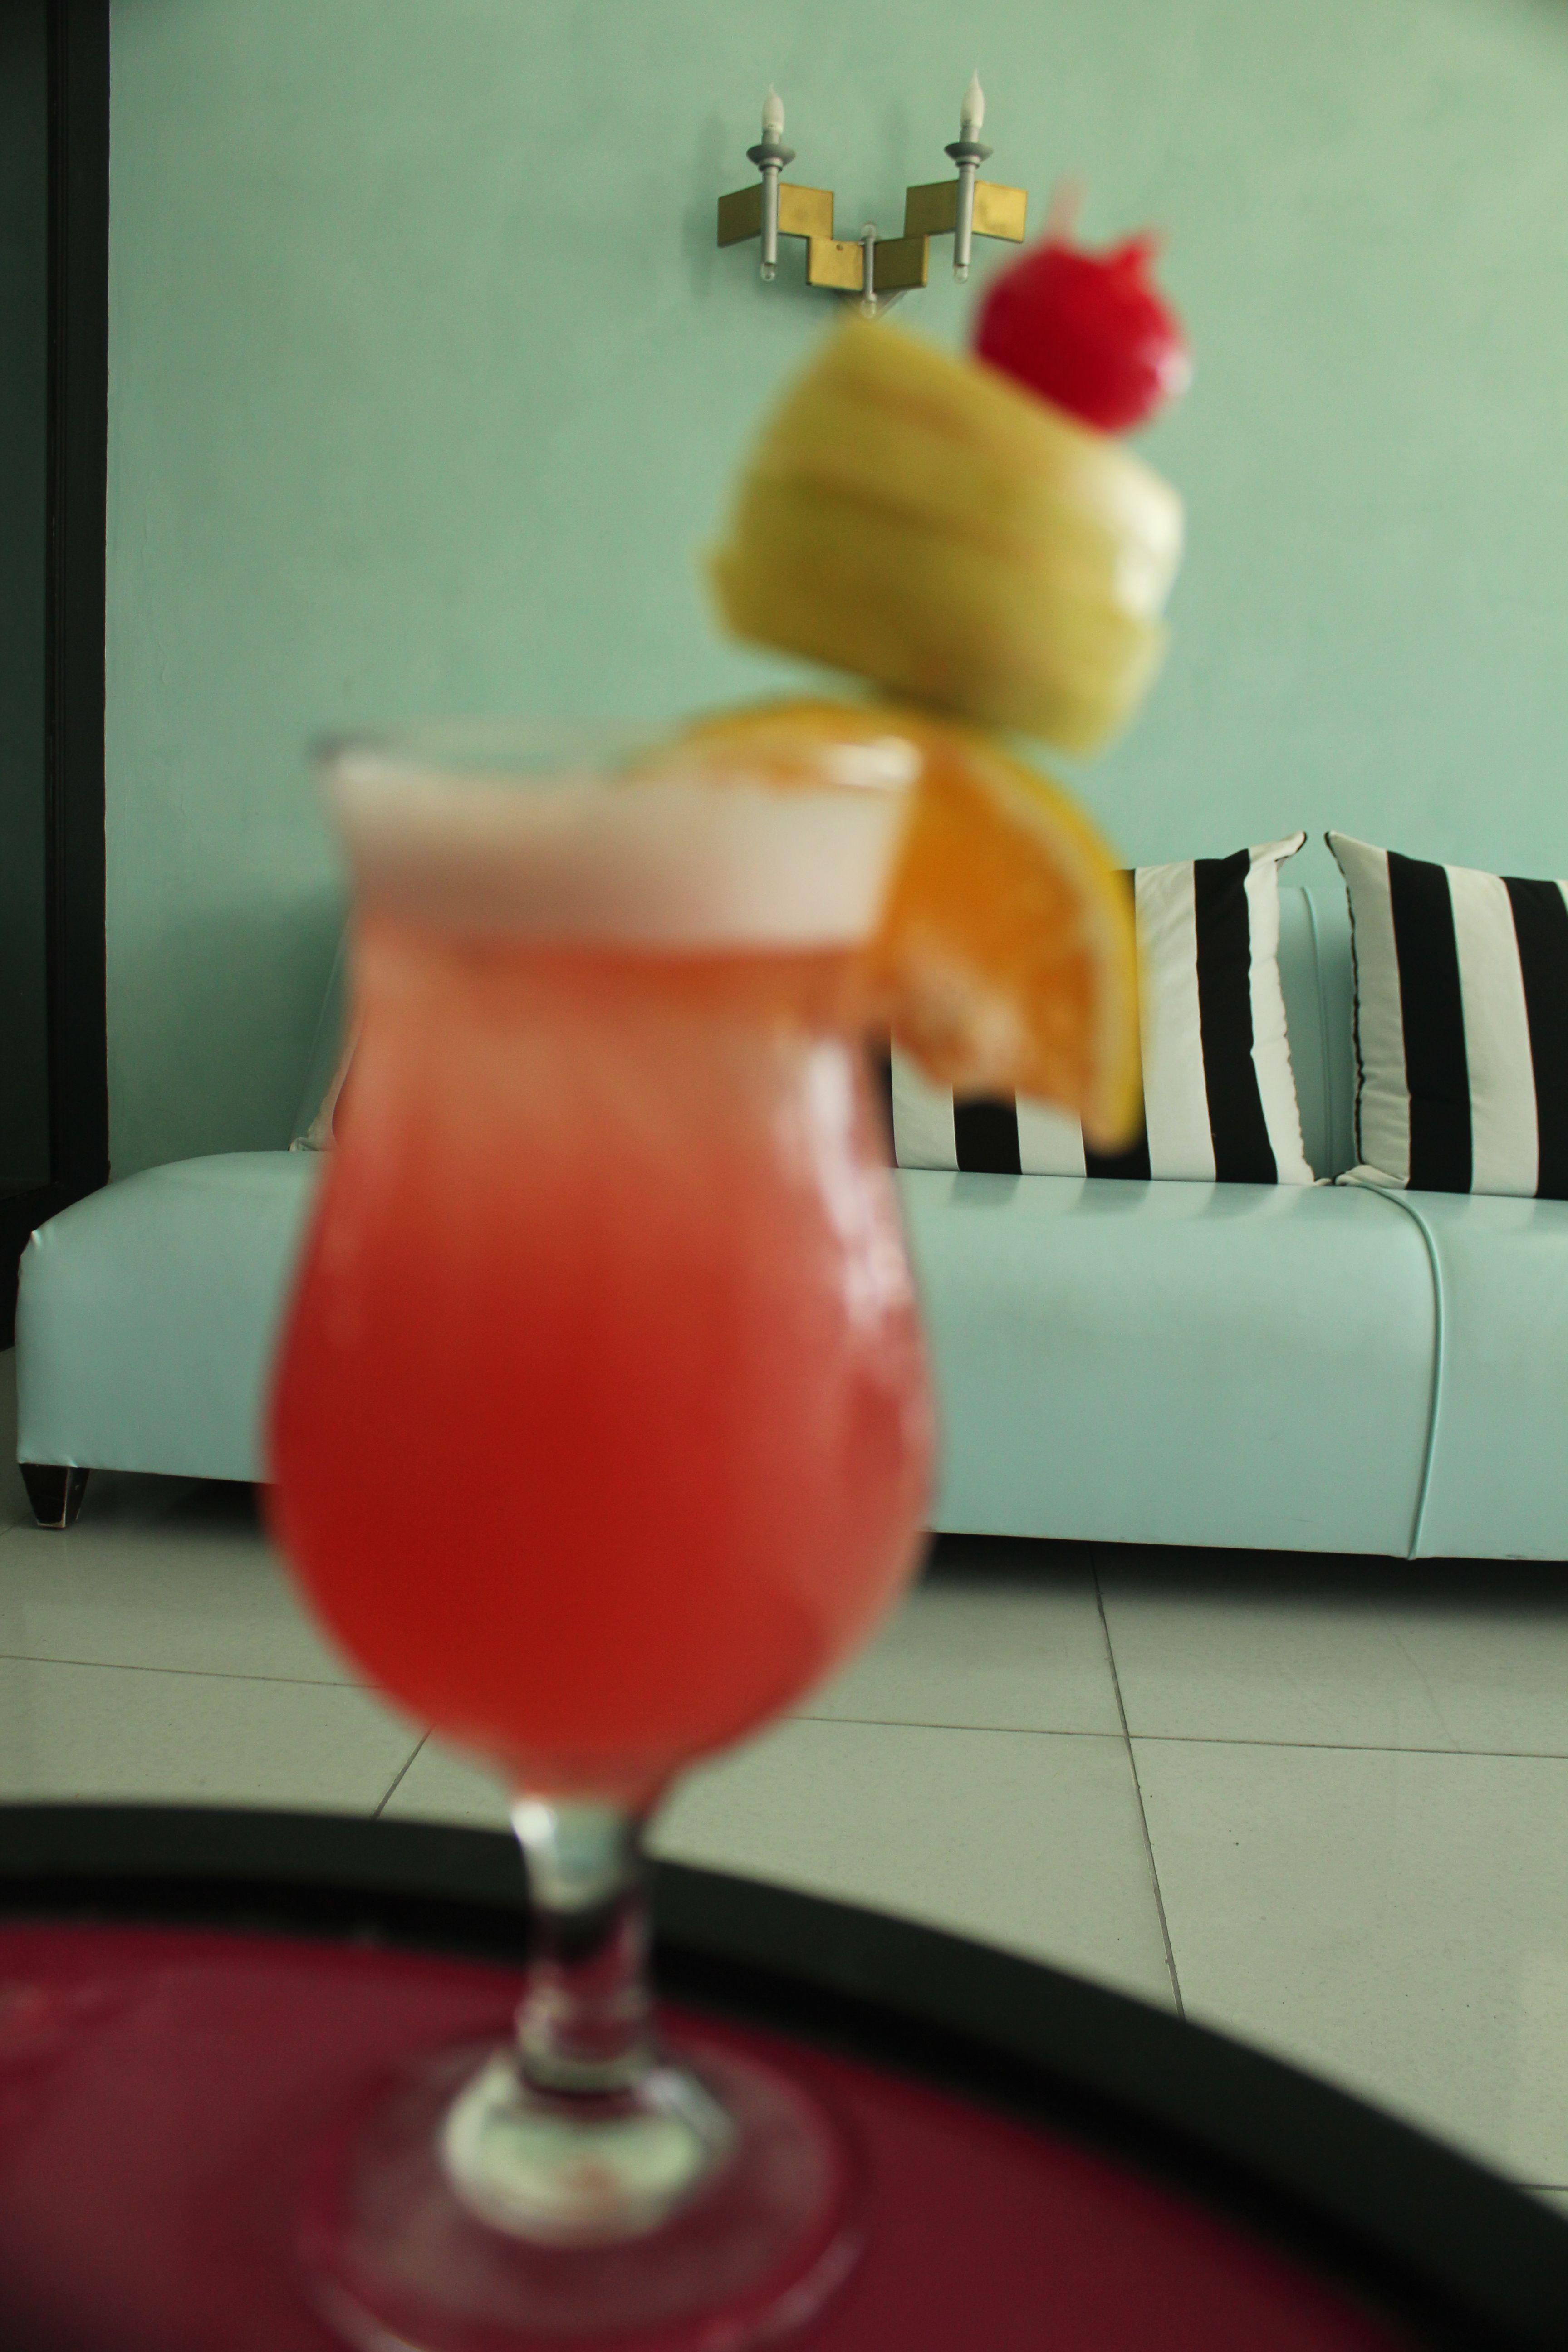 Celebrate One Love Jamaicanstyle 1 Oz Apricot Liqueur 2 Oz Pineapple Juice 1 Oz Orange Juice Strawberry Syr Caribbean Recipes Fun Drinks Strawberry Syrup